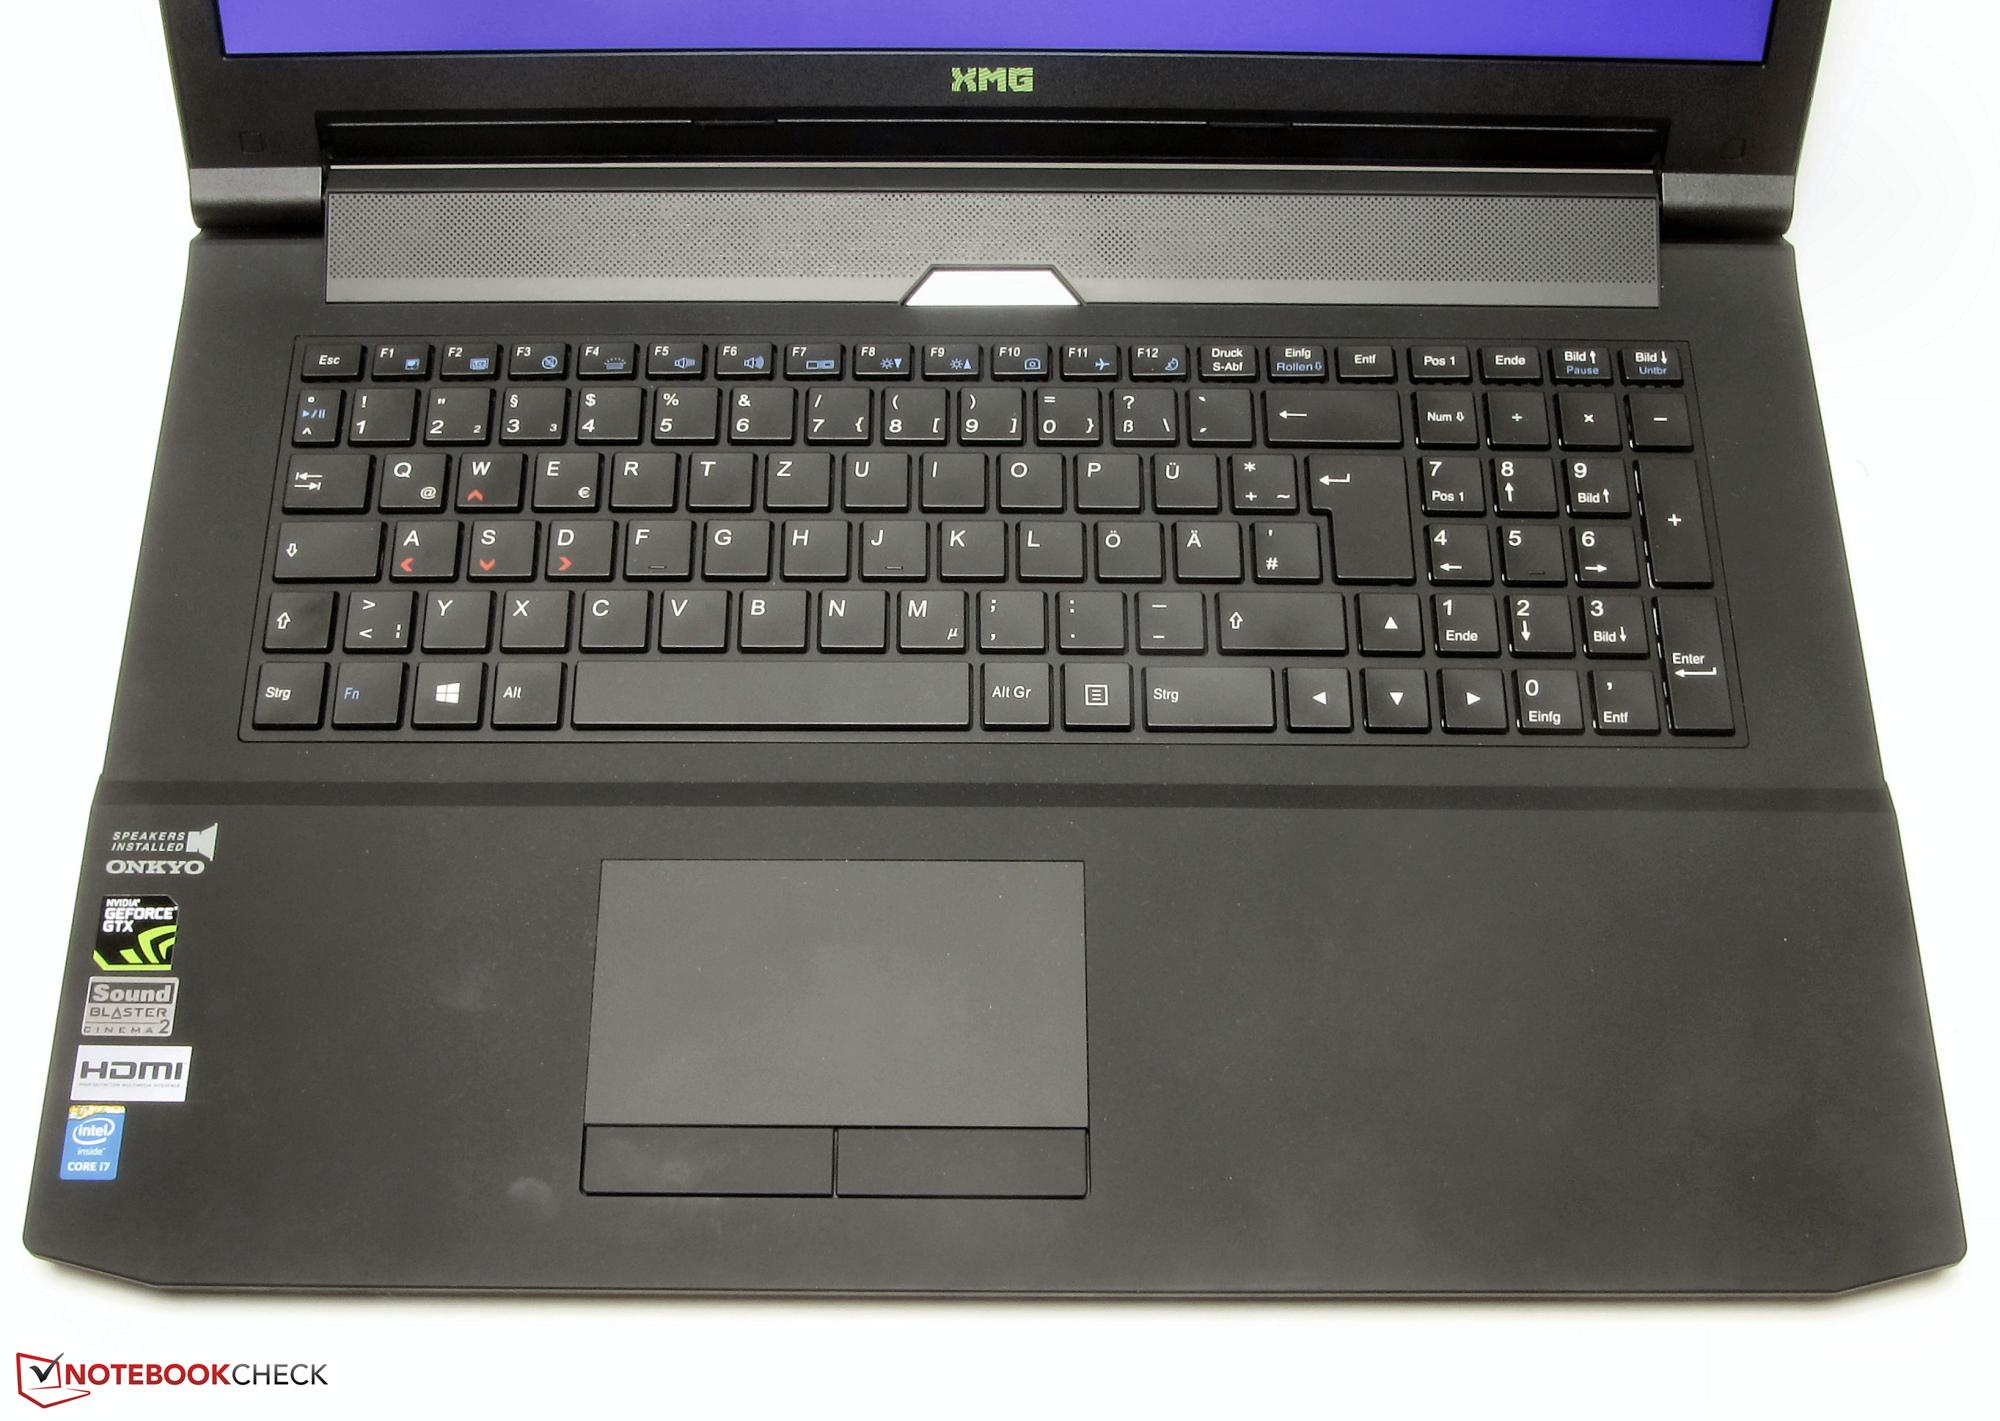 onkyo laptop. full resolution onkyo laptop